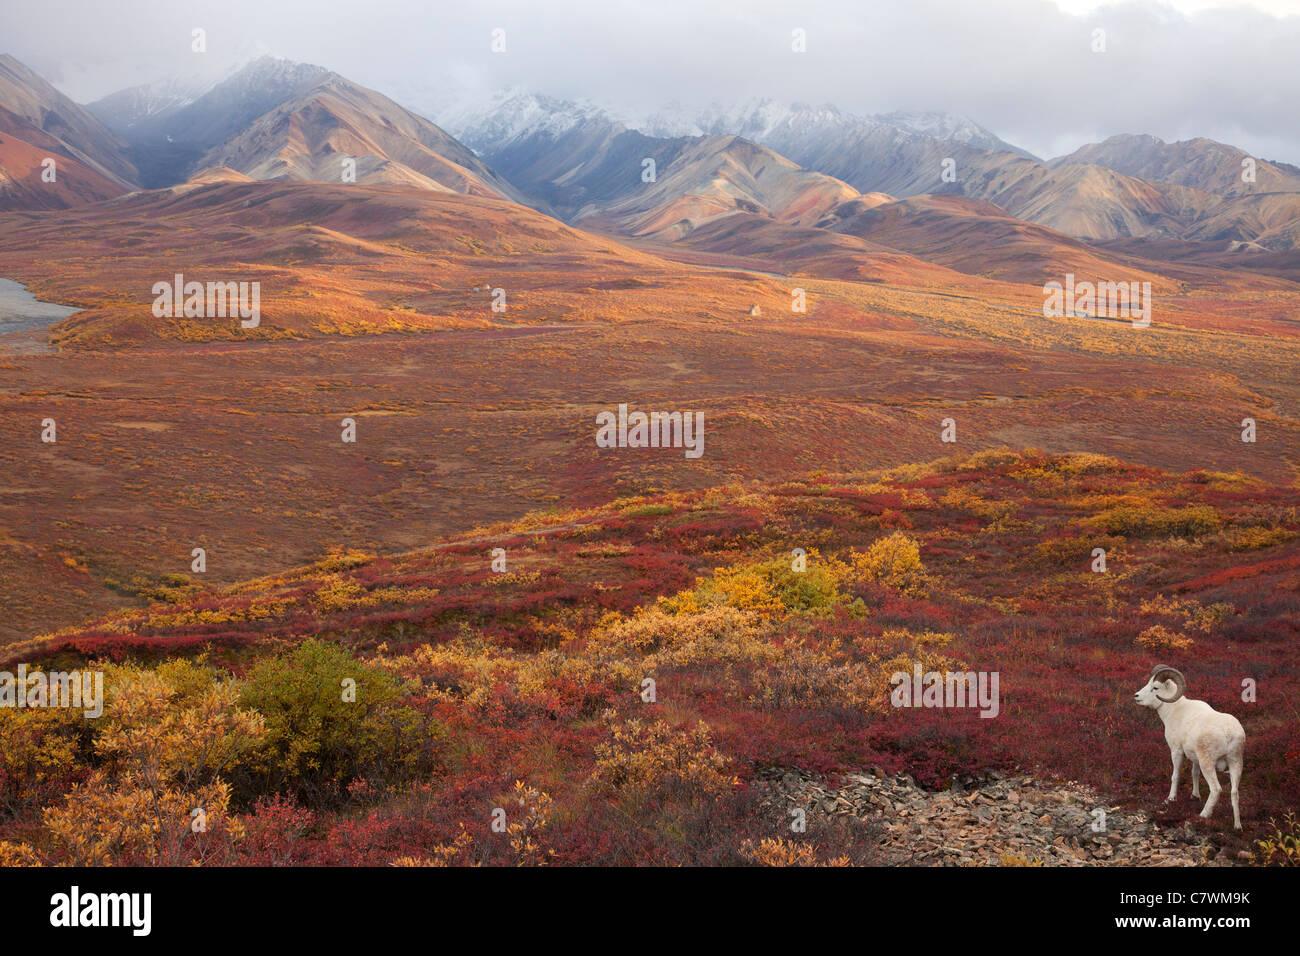 Dall's Sheep, Polychrome Pass, Denali National Park, Alaska. - Stock Image